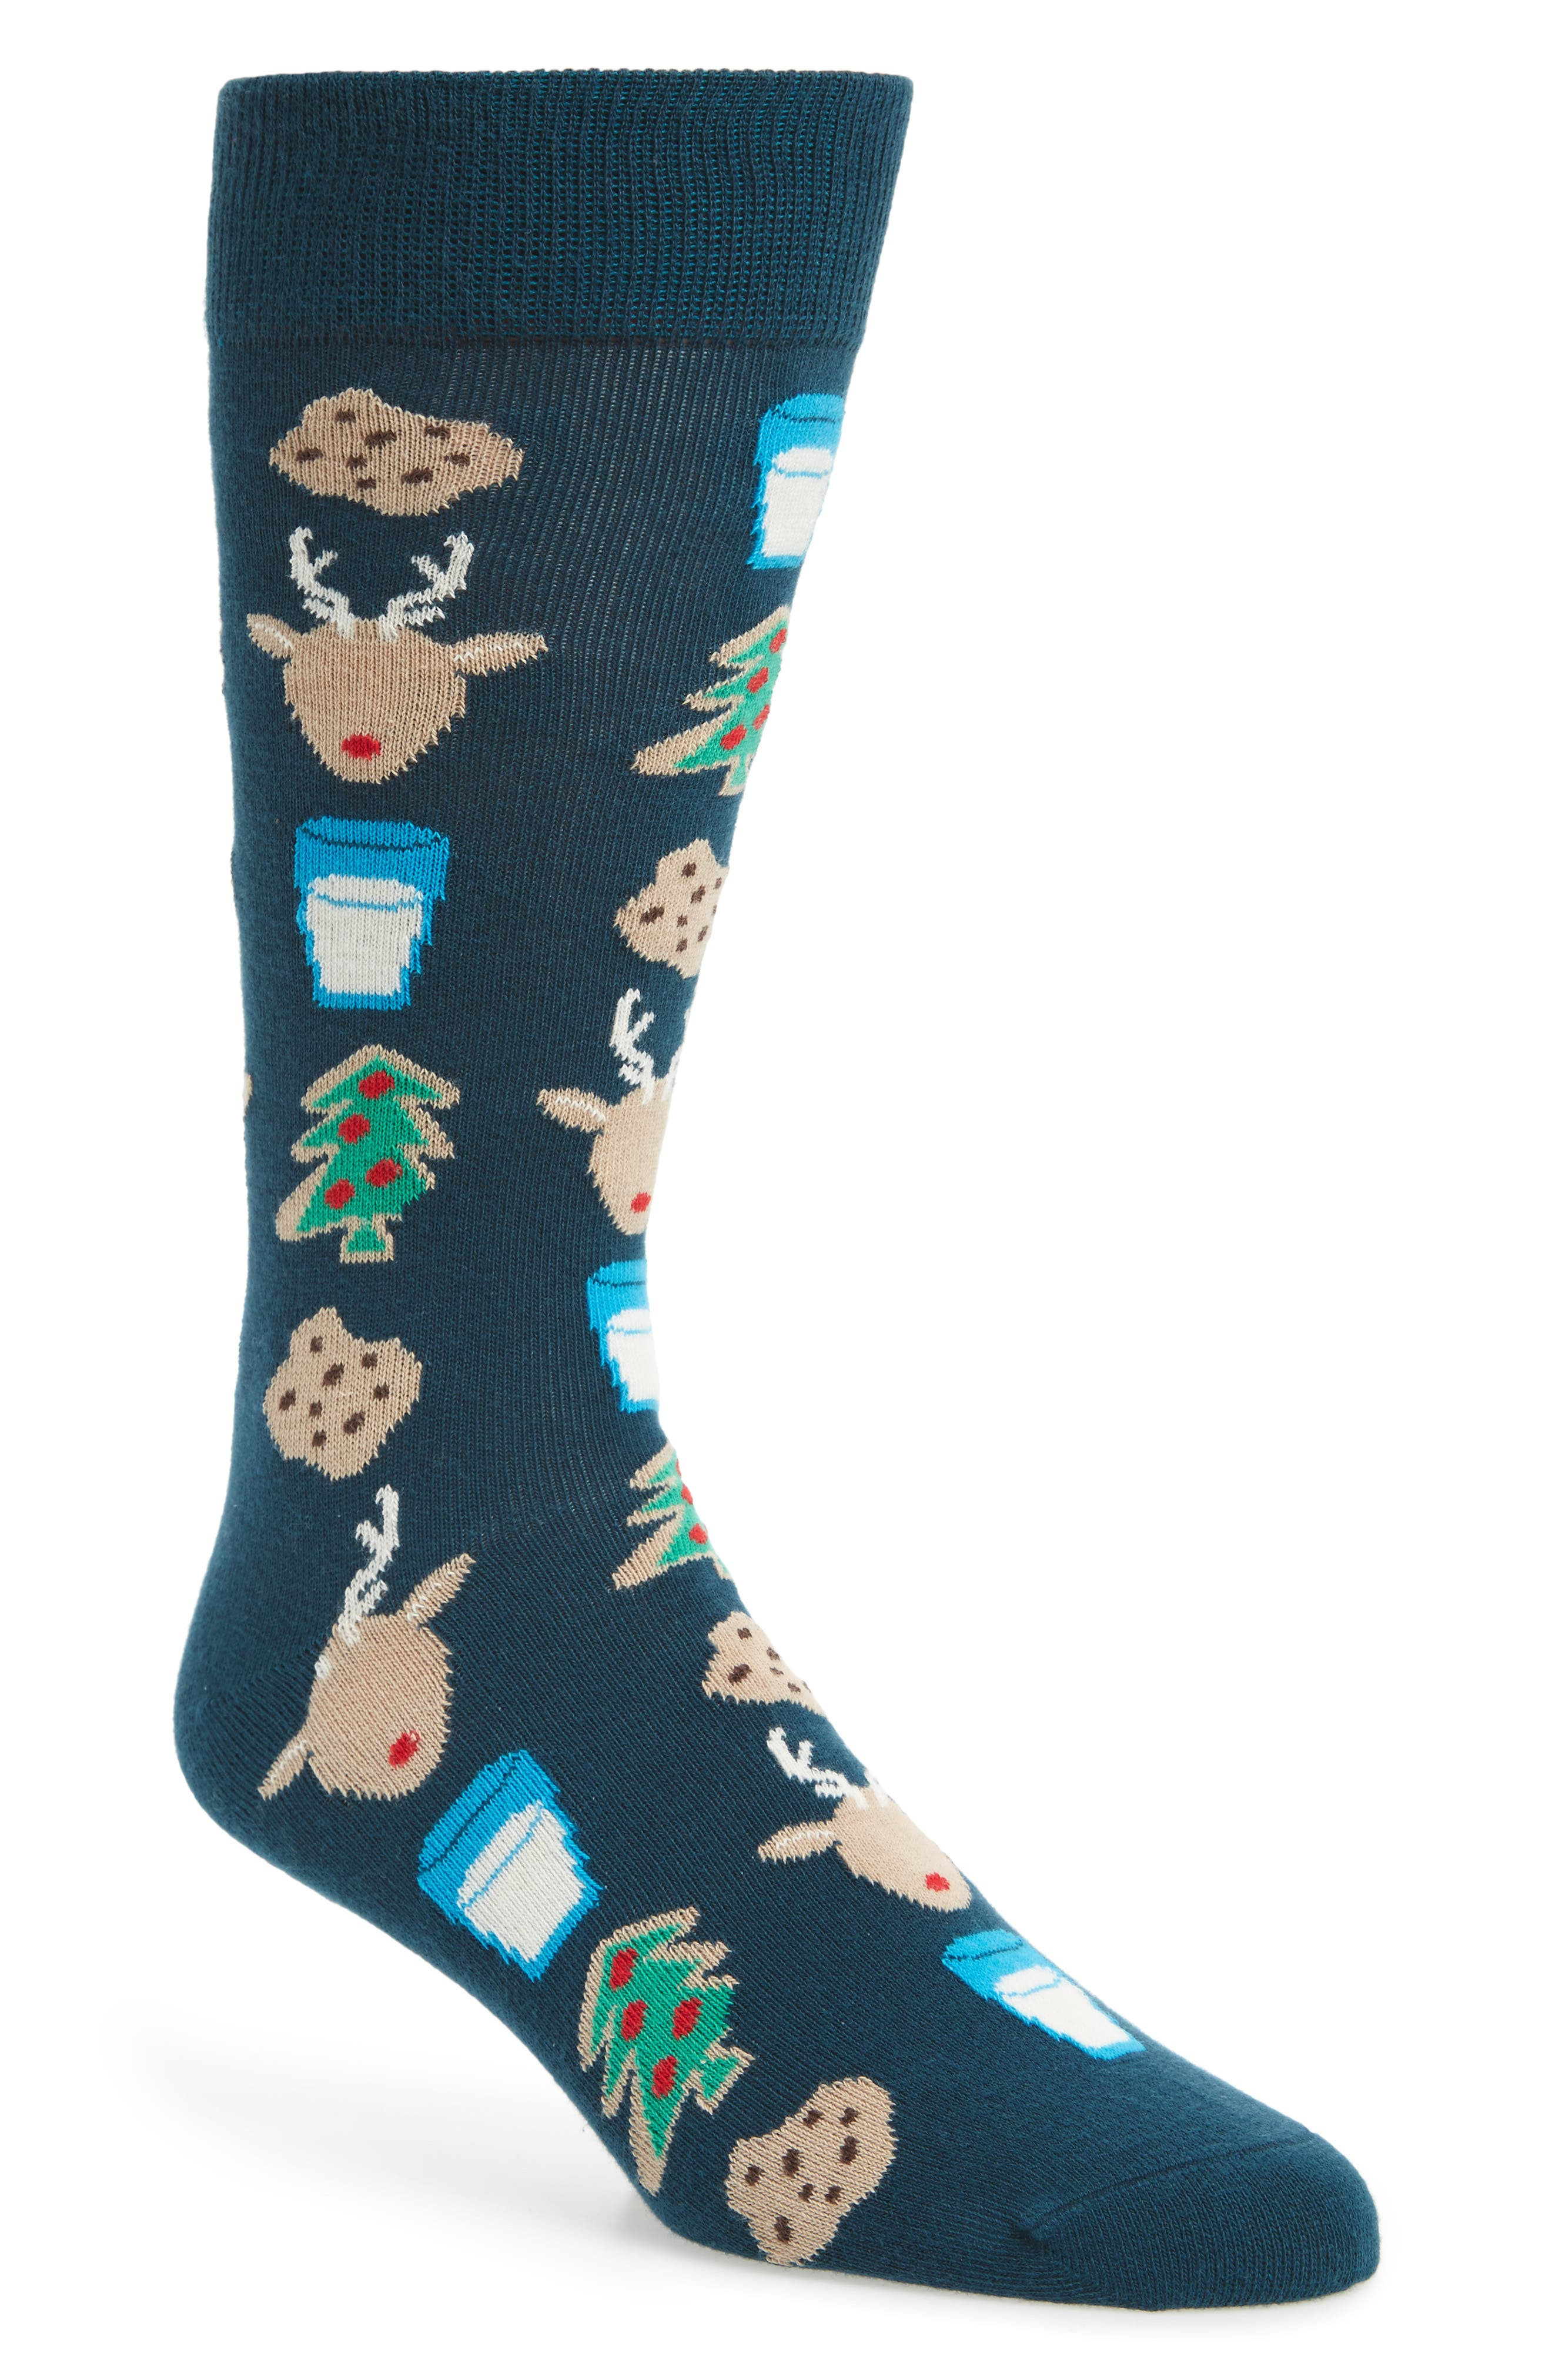 Happy Socks Christmas Socks